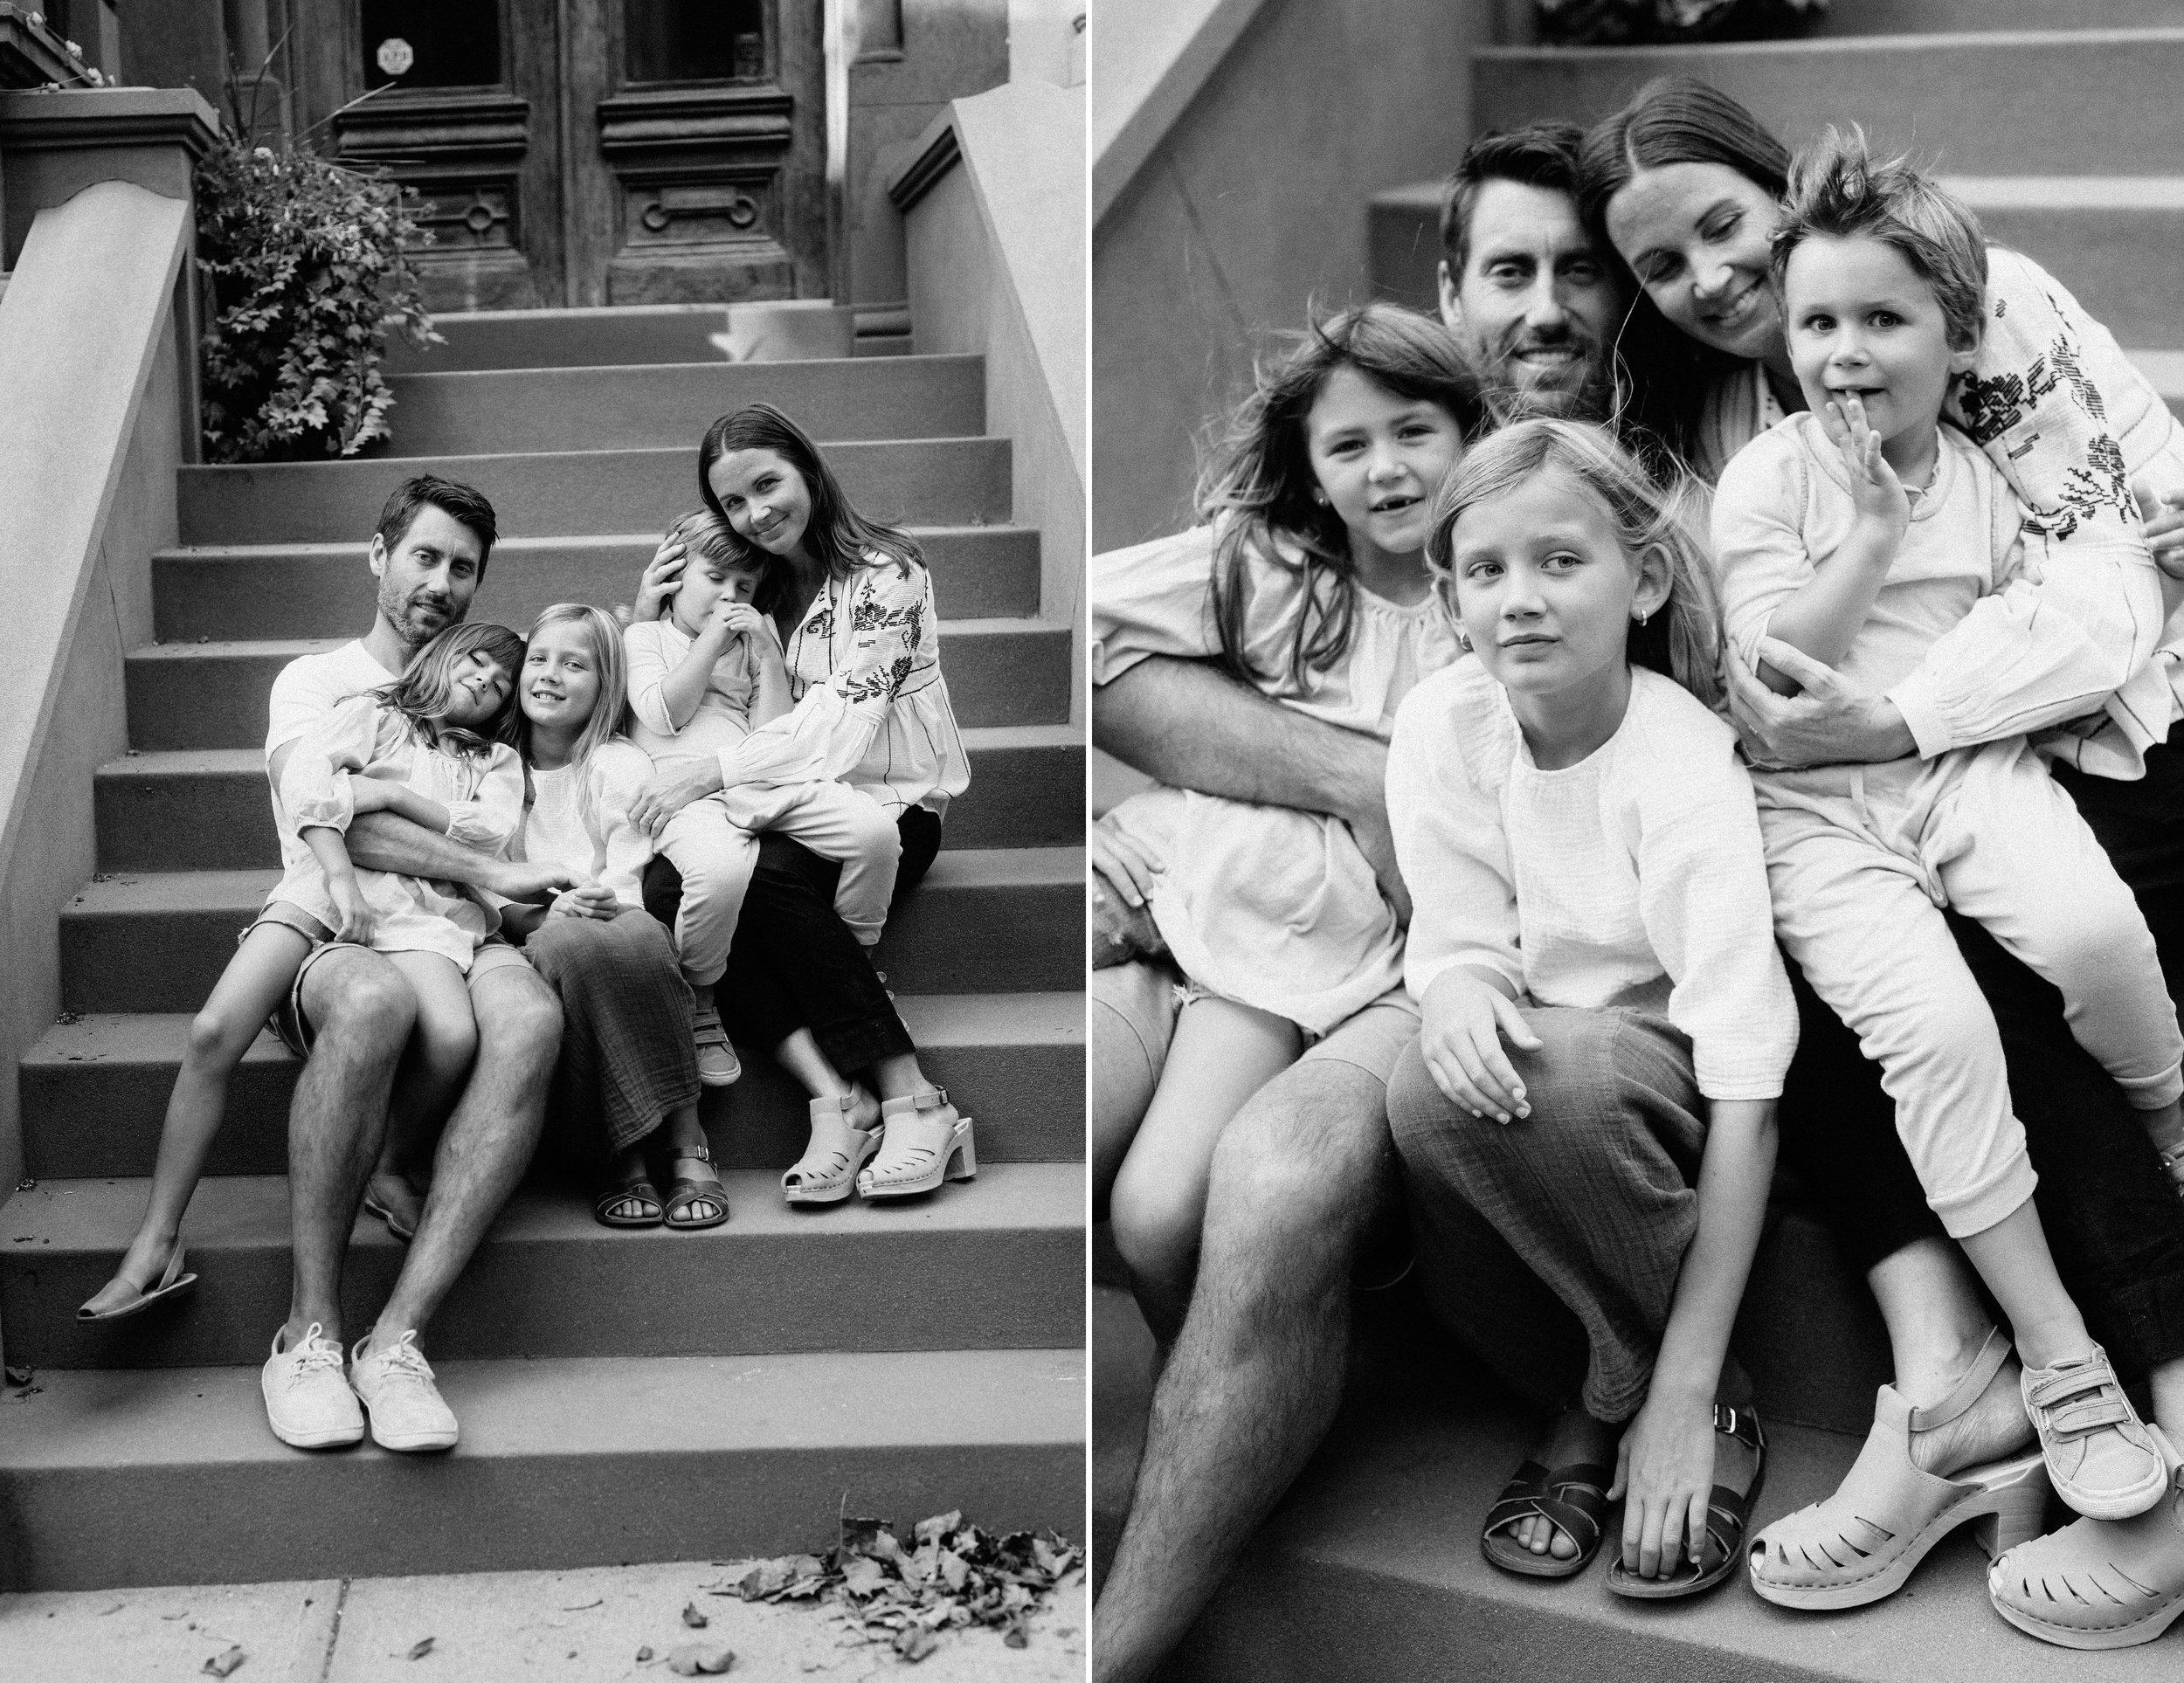 park-slope-brooklyn-family-photography_in-home-session_nicki-sebastian-photography_new-york-14.jpg